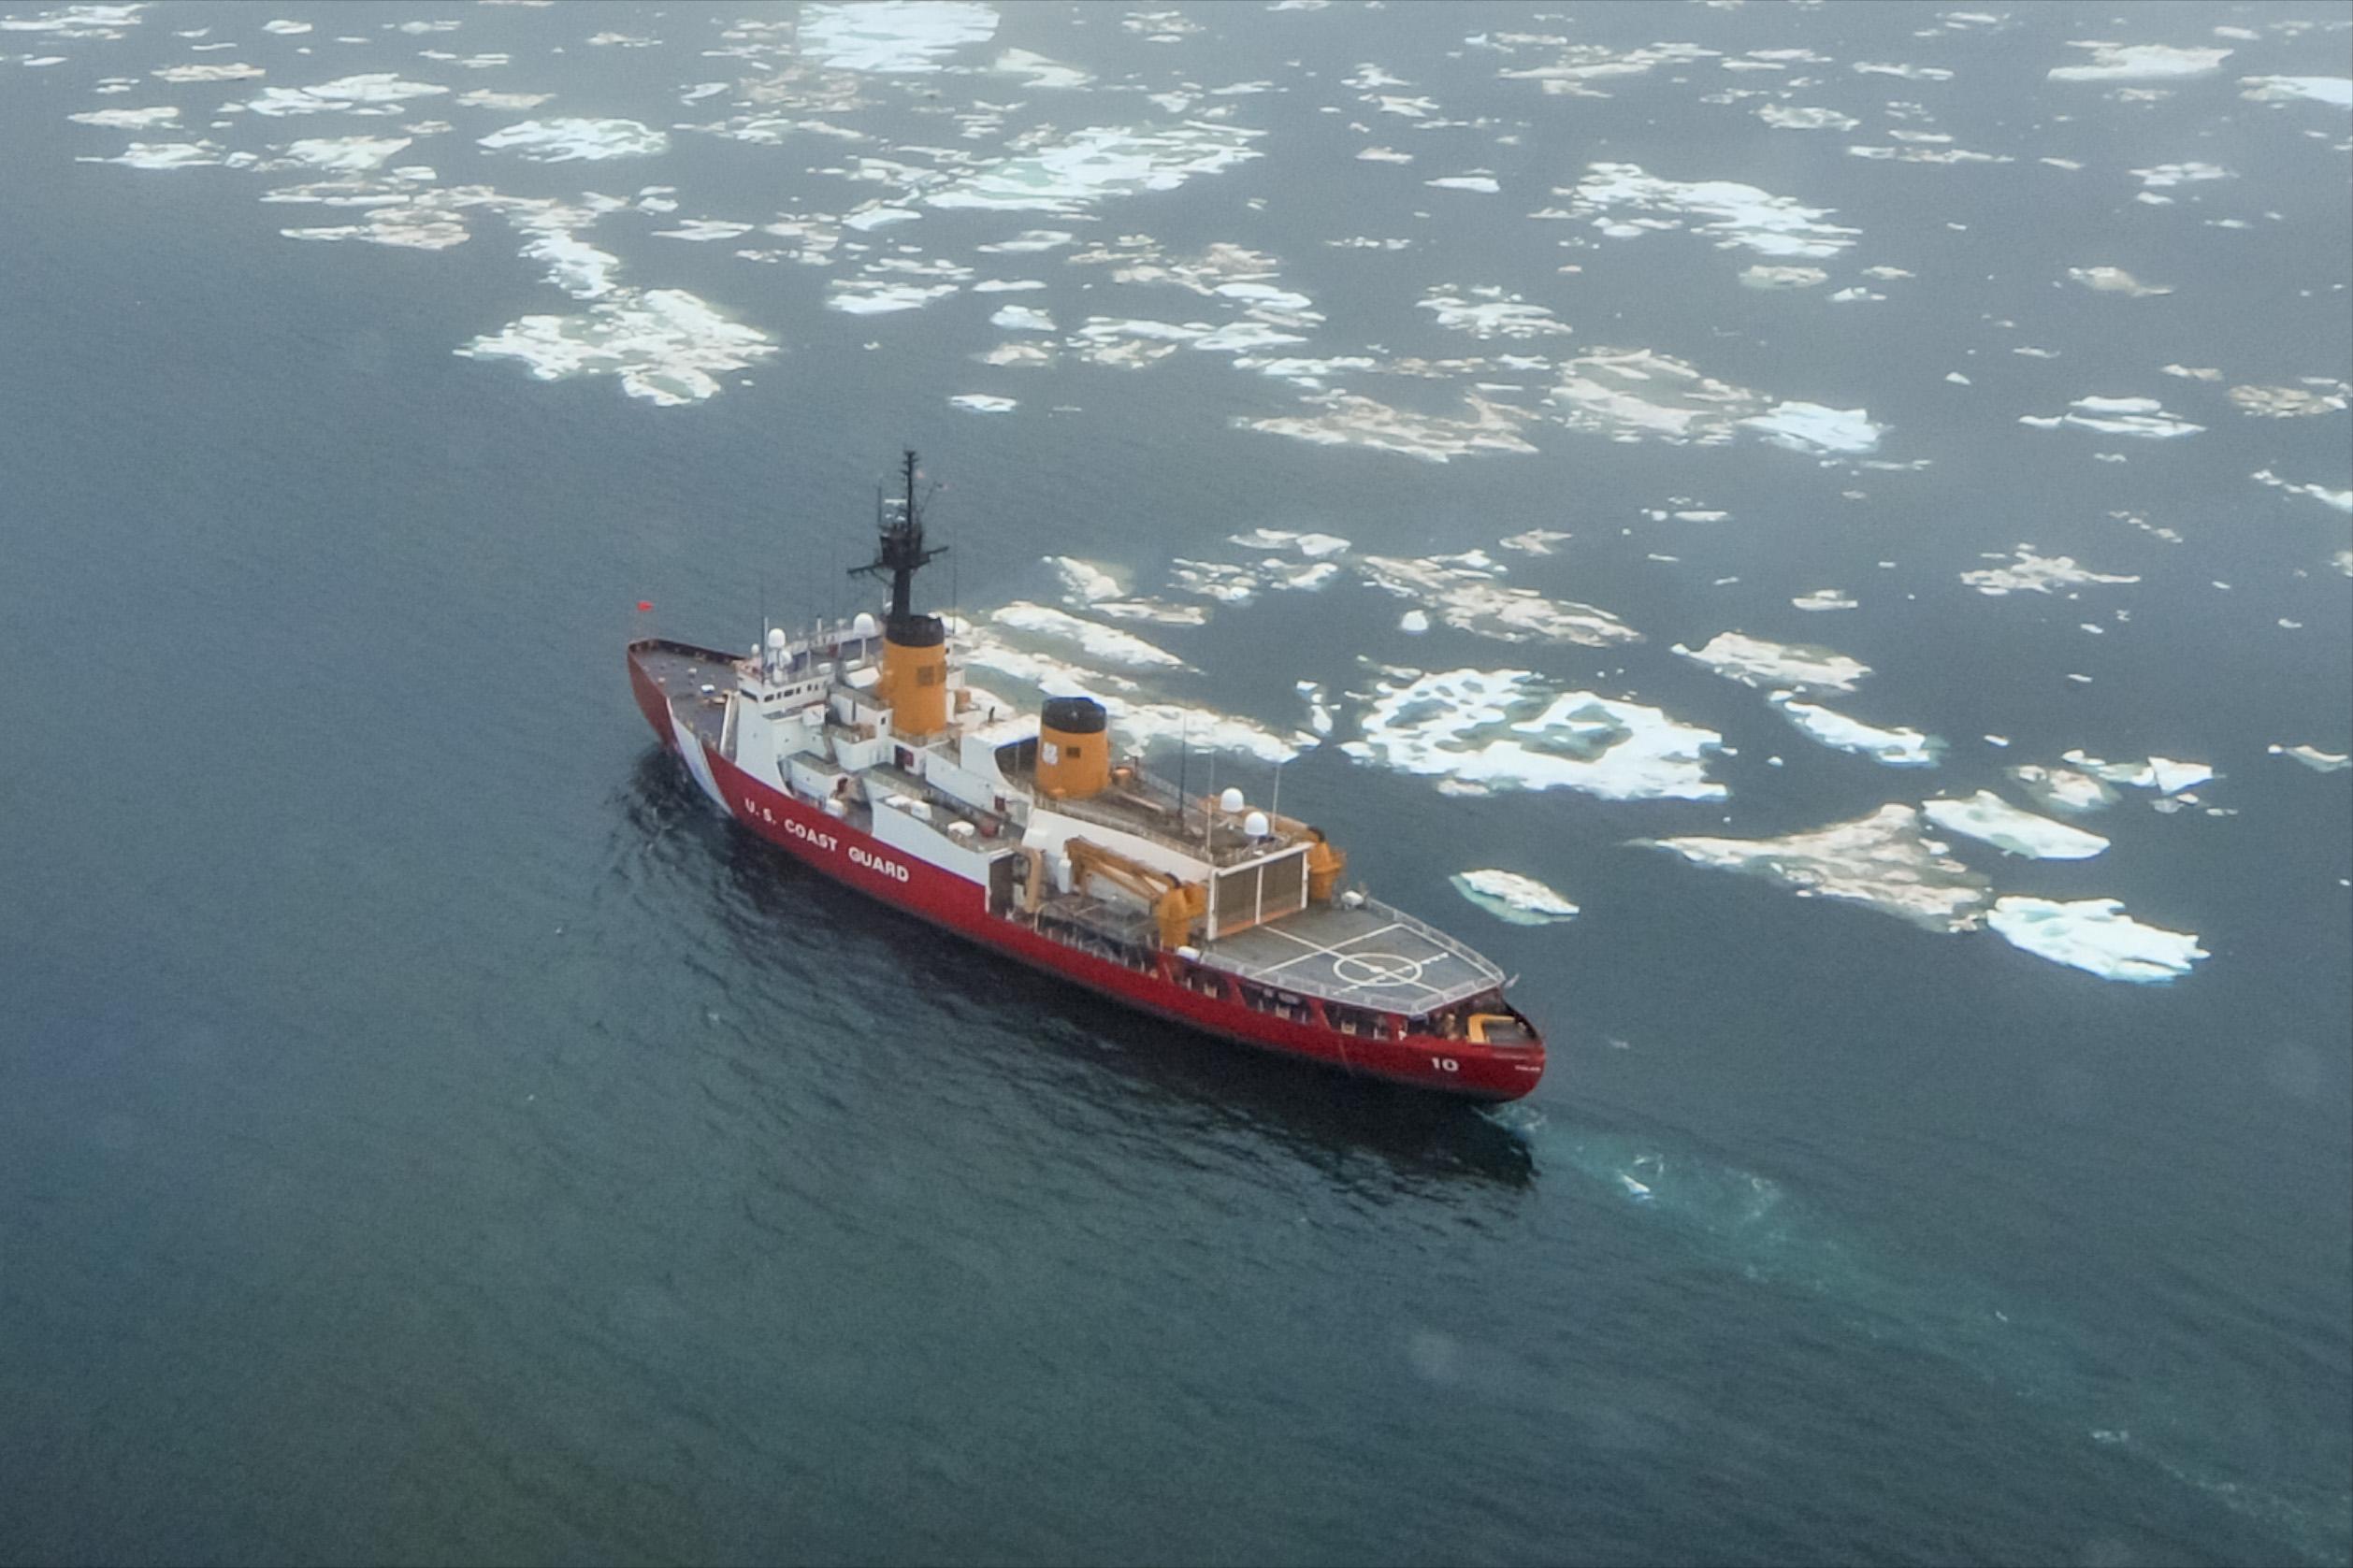 The U.S. heavy-duty Coast Guard icebreaker Polar Star will make a winter voyage to Arctic Alaska